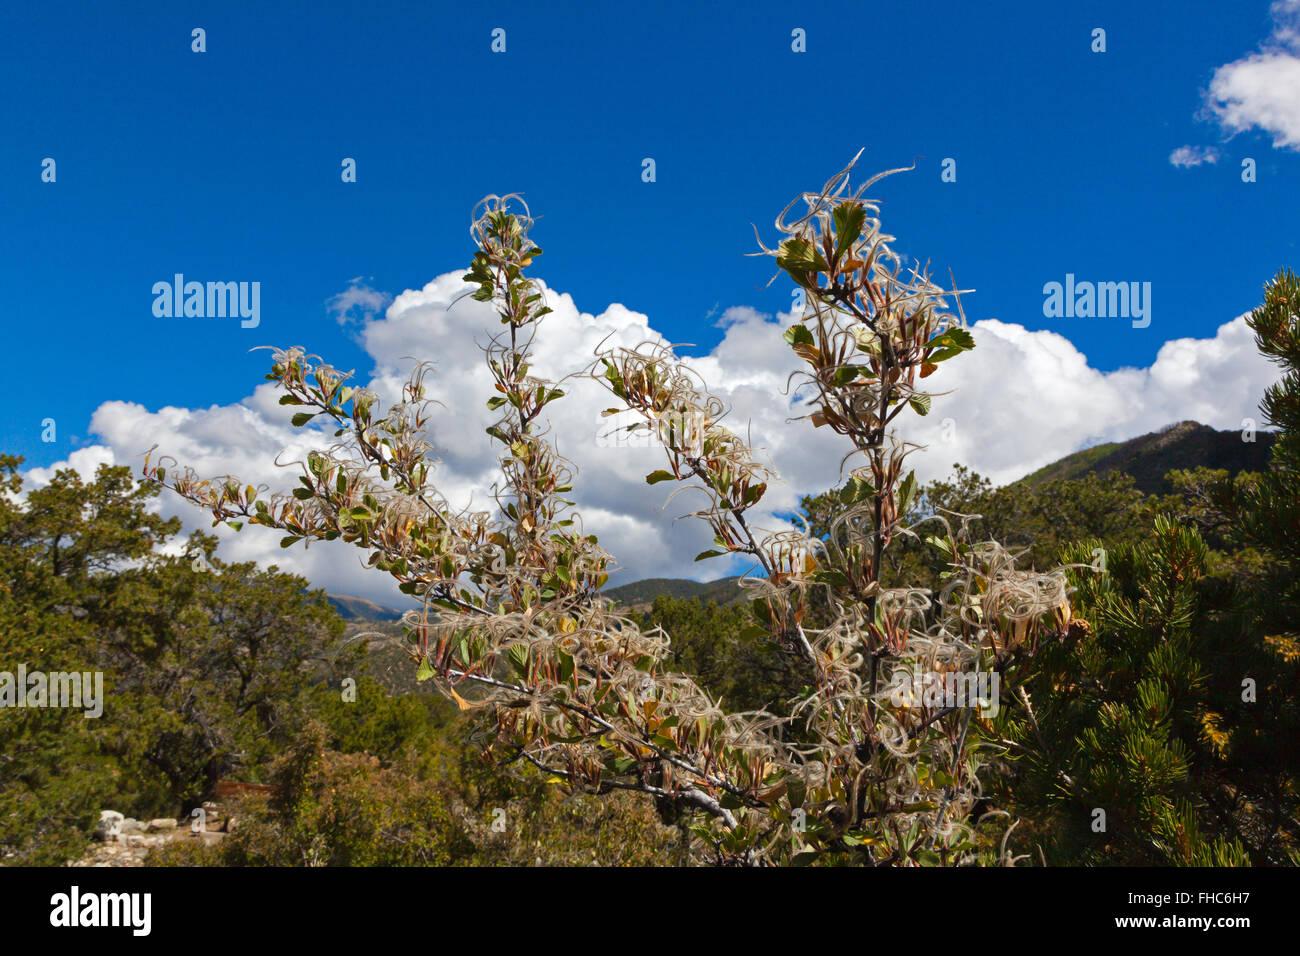 MOUNTAIN MAHOGONY (Cercocarpus montanus) seeds  in the Rocky Mountains - COLORADO - Stock Image